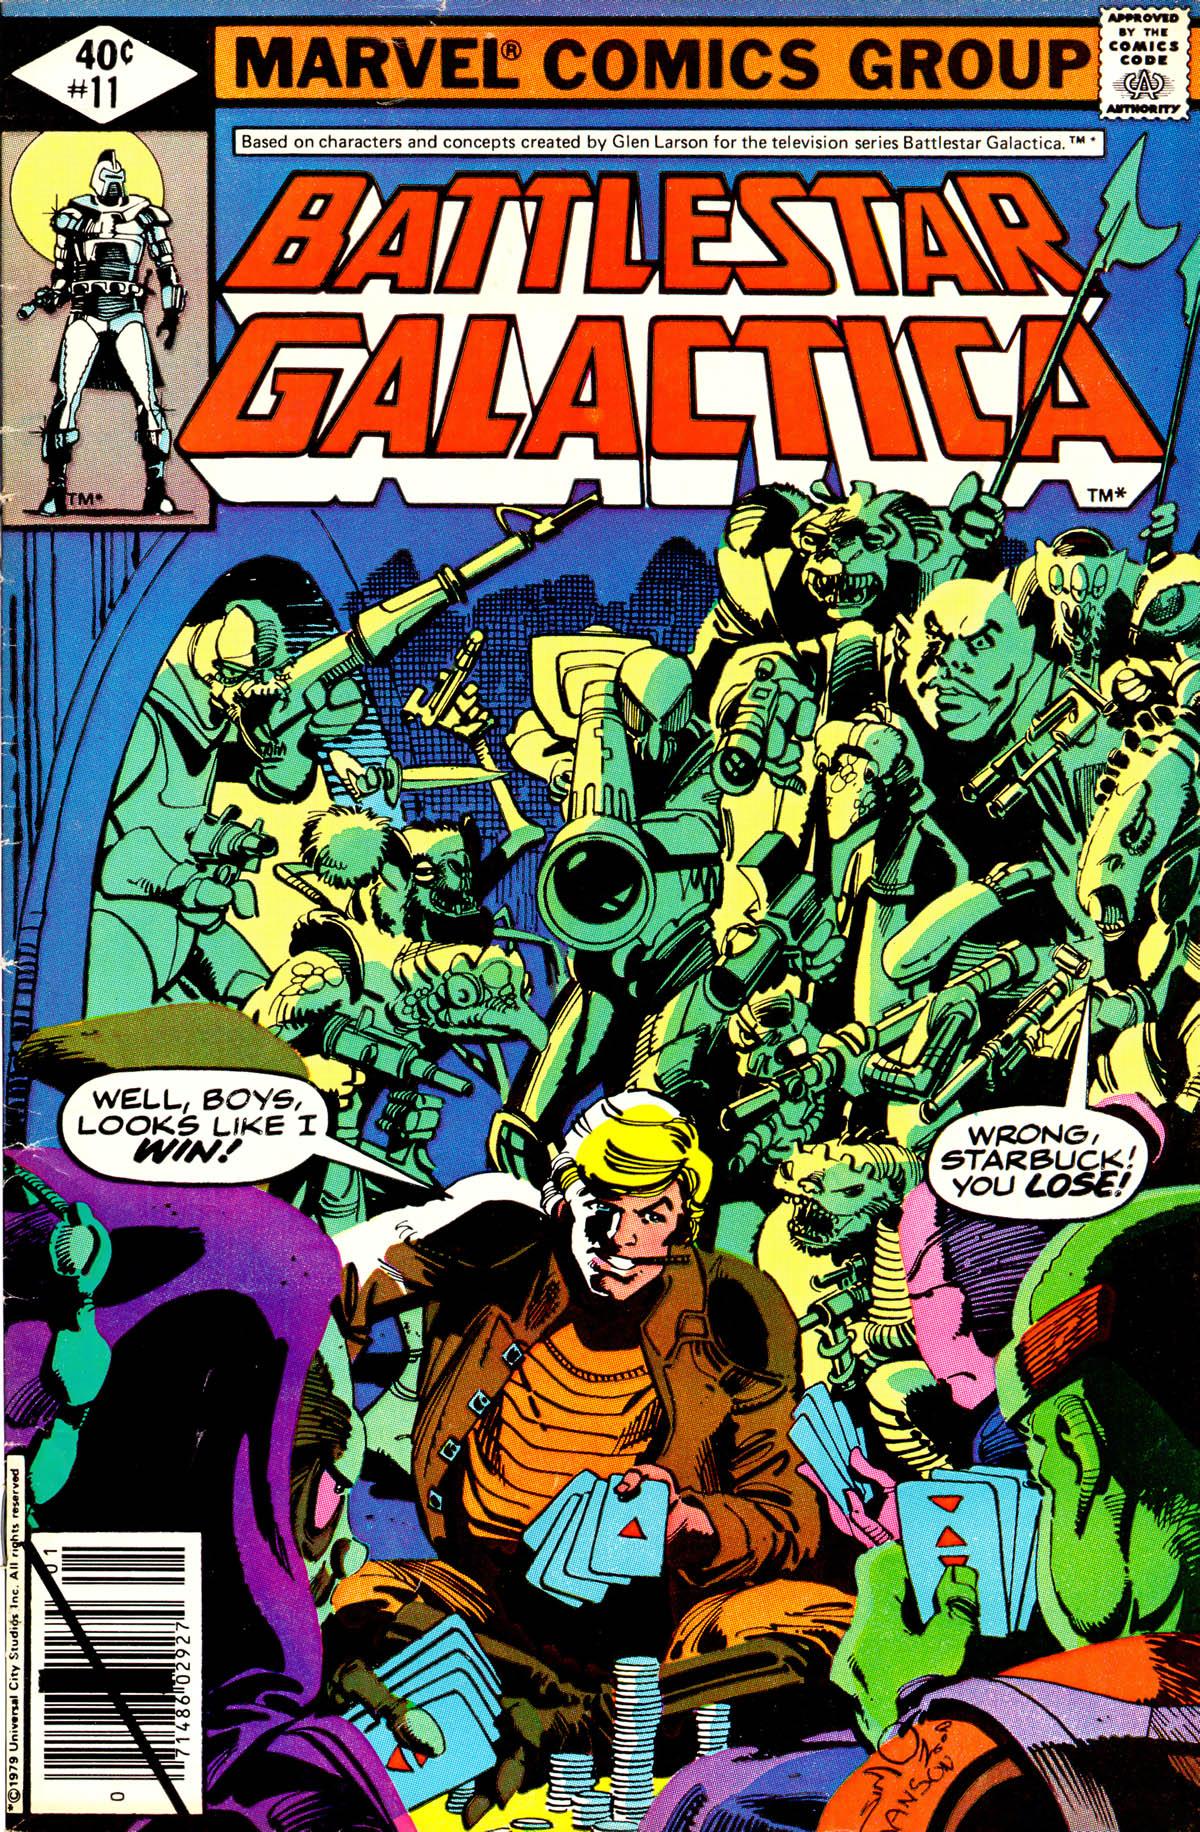 Battlestar Galactica 11 Page 1